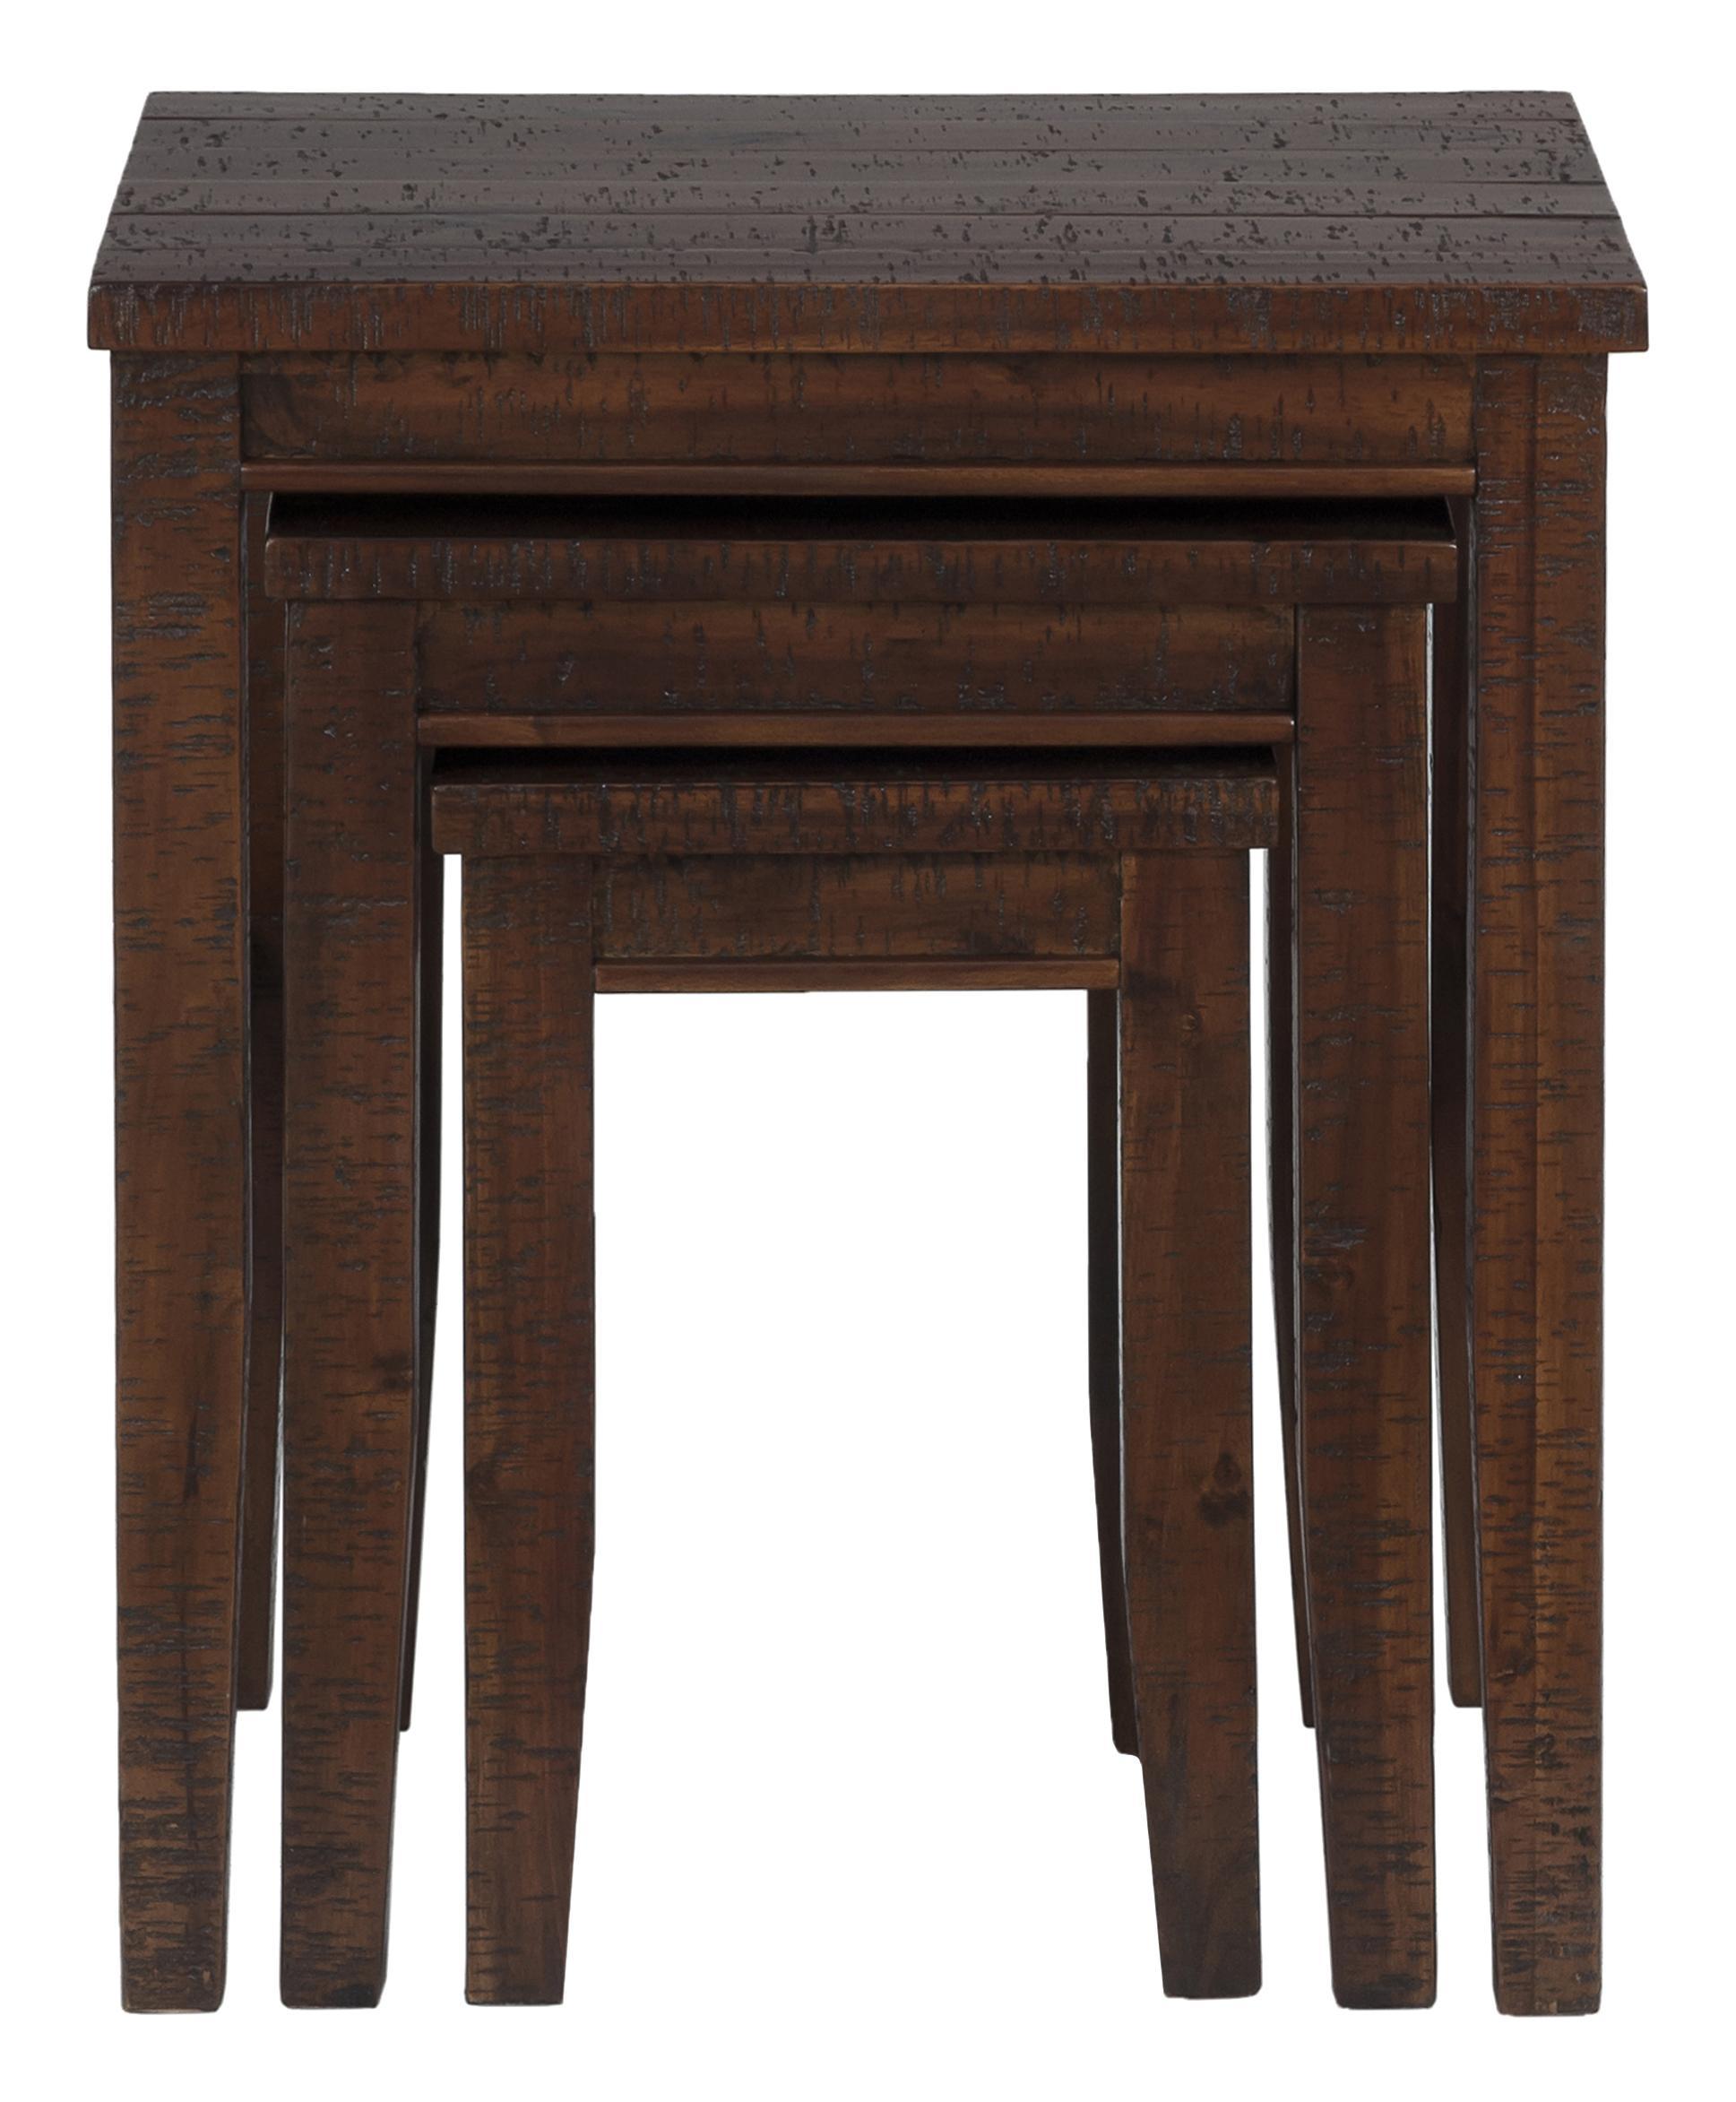 Urban Lodge Brown 3 Nesting Chairside Table by Jofran at Pilgrim Furniture City